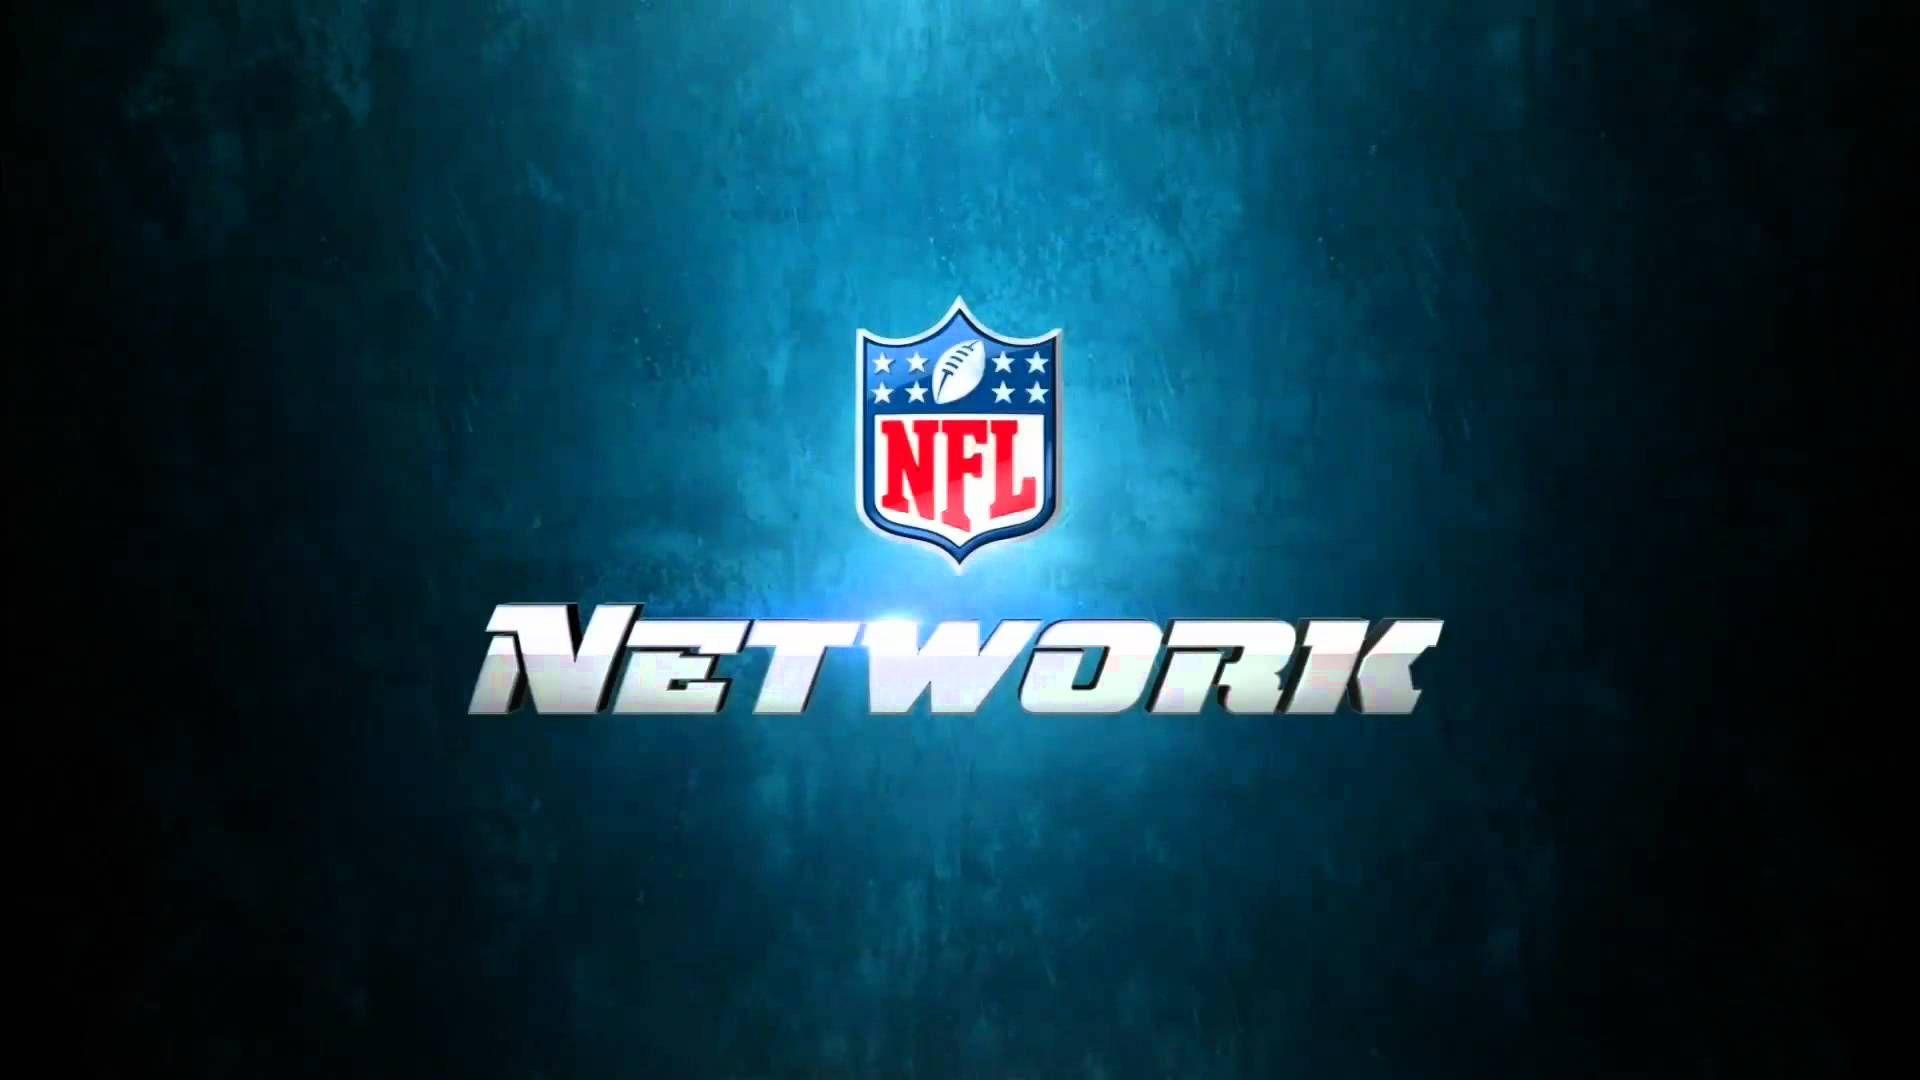 Broncos Vs Seahawks Live Stream Nfl Network Nfl Nfl Logo